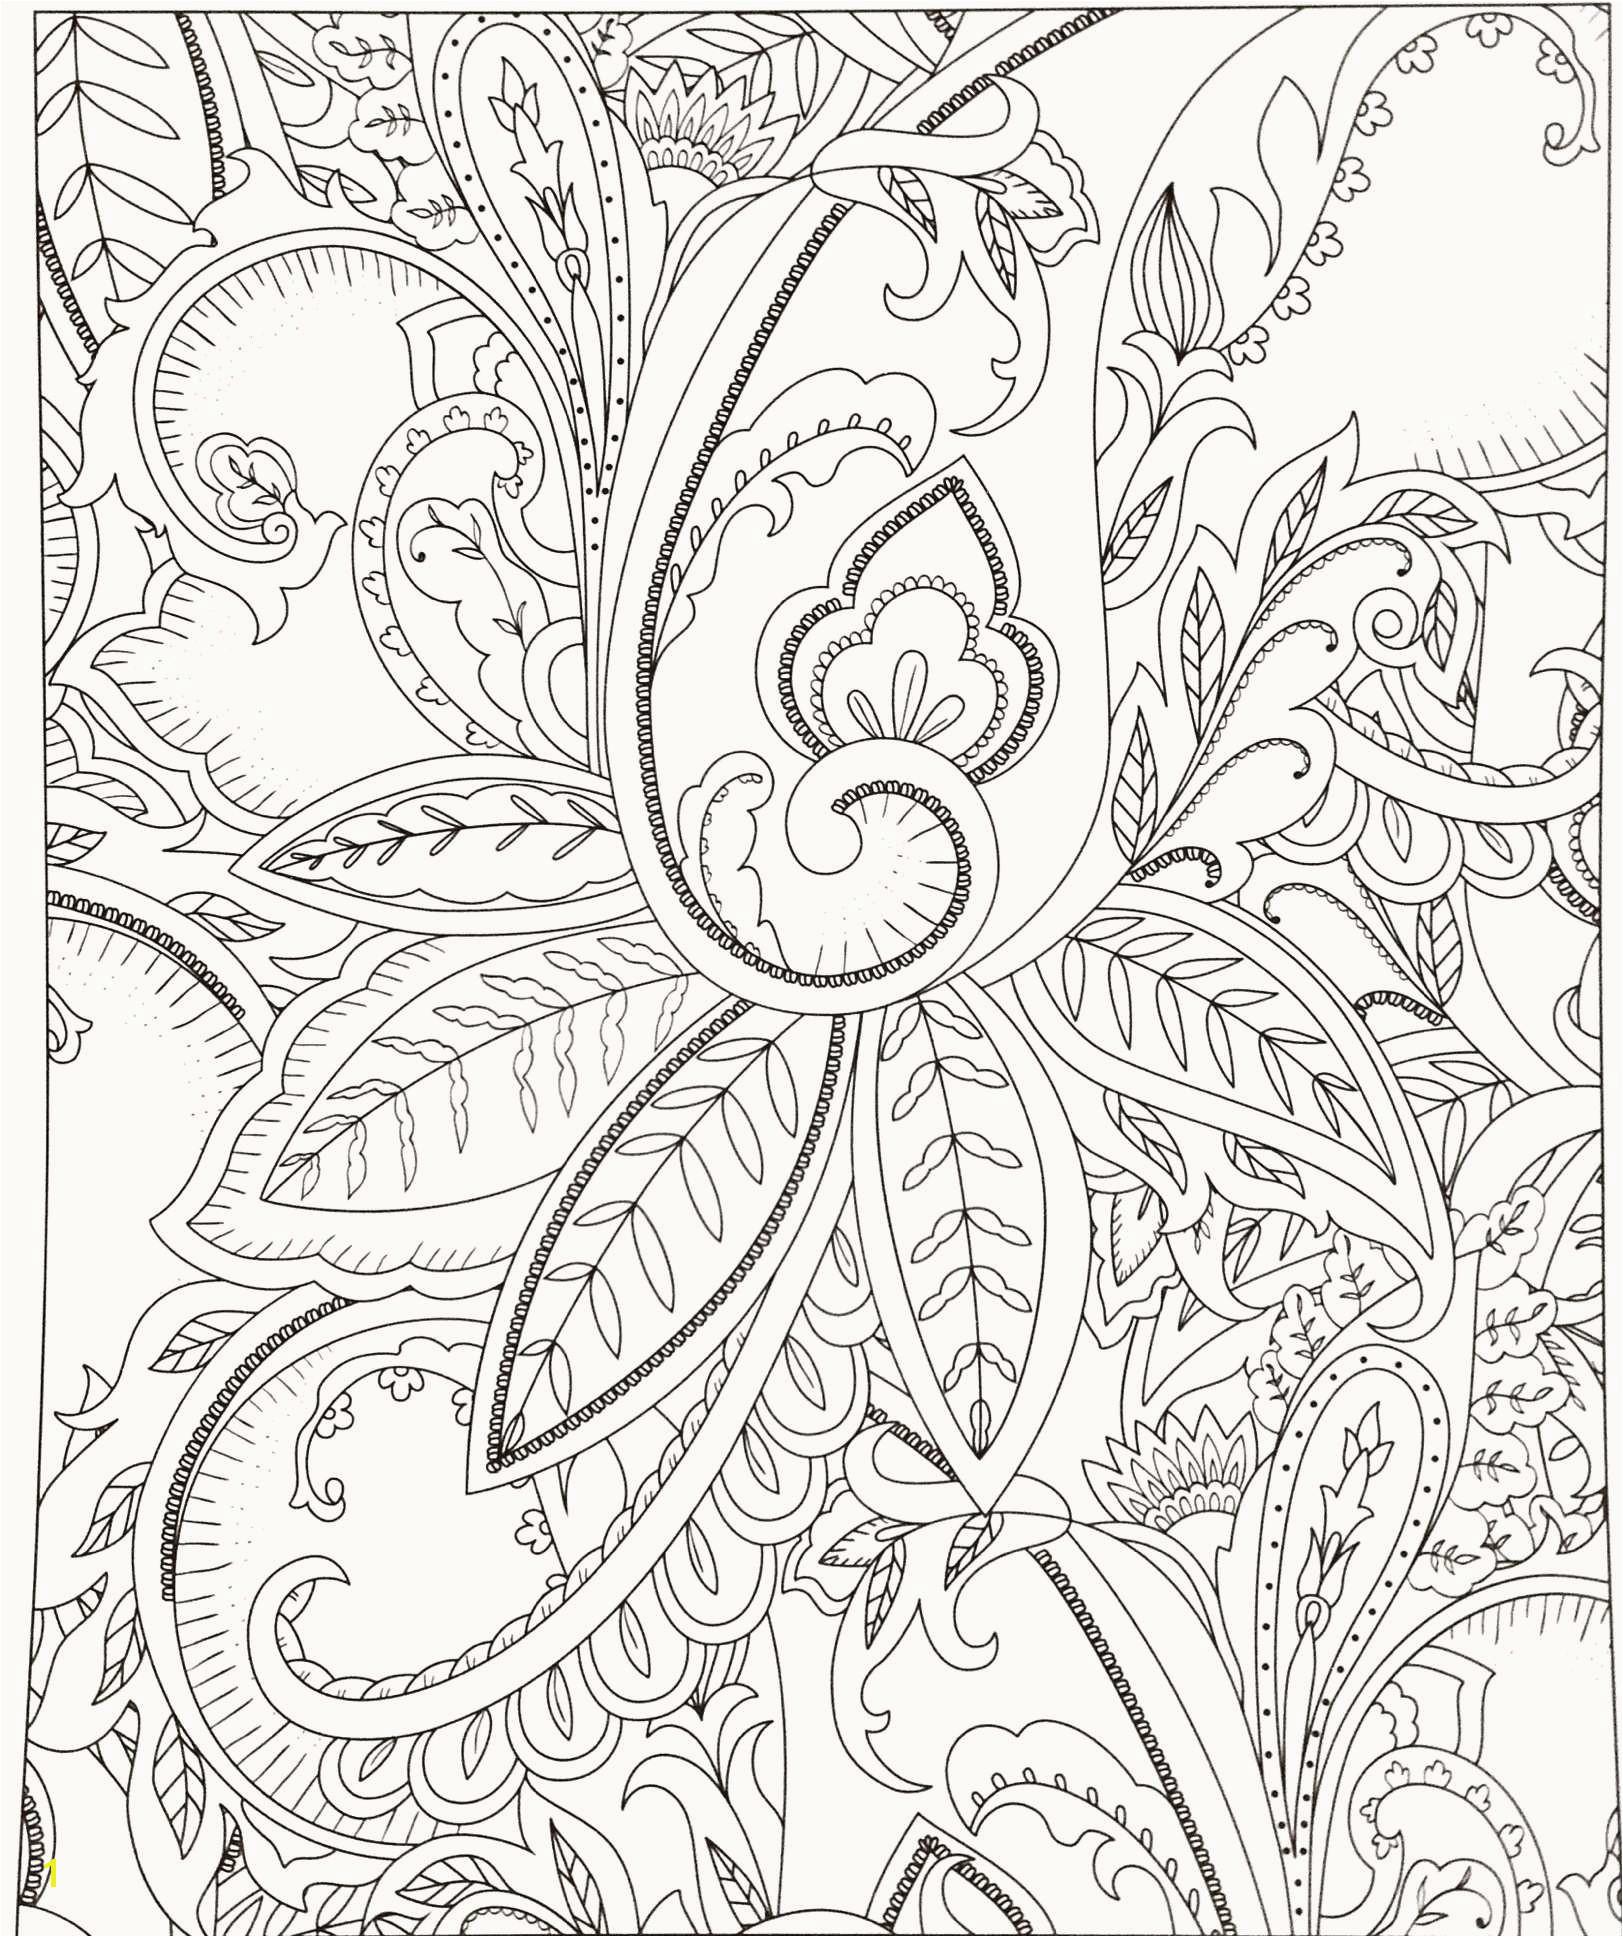 Divergent Coloring Pages Divergent Coloring Pages New Divergent Coloring Pages 13 Luxury